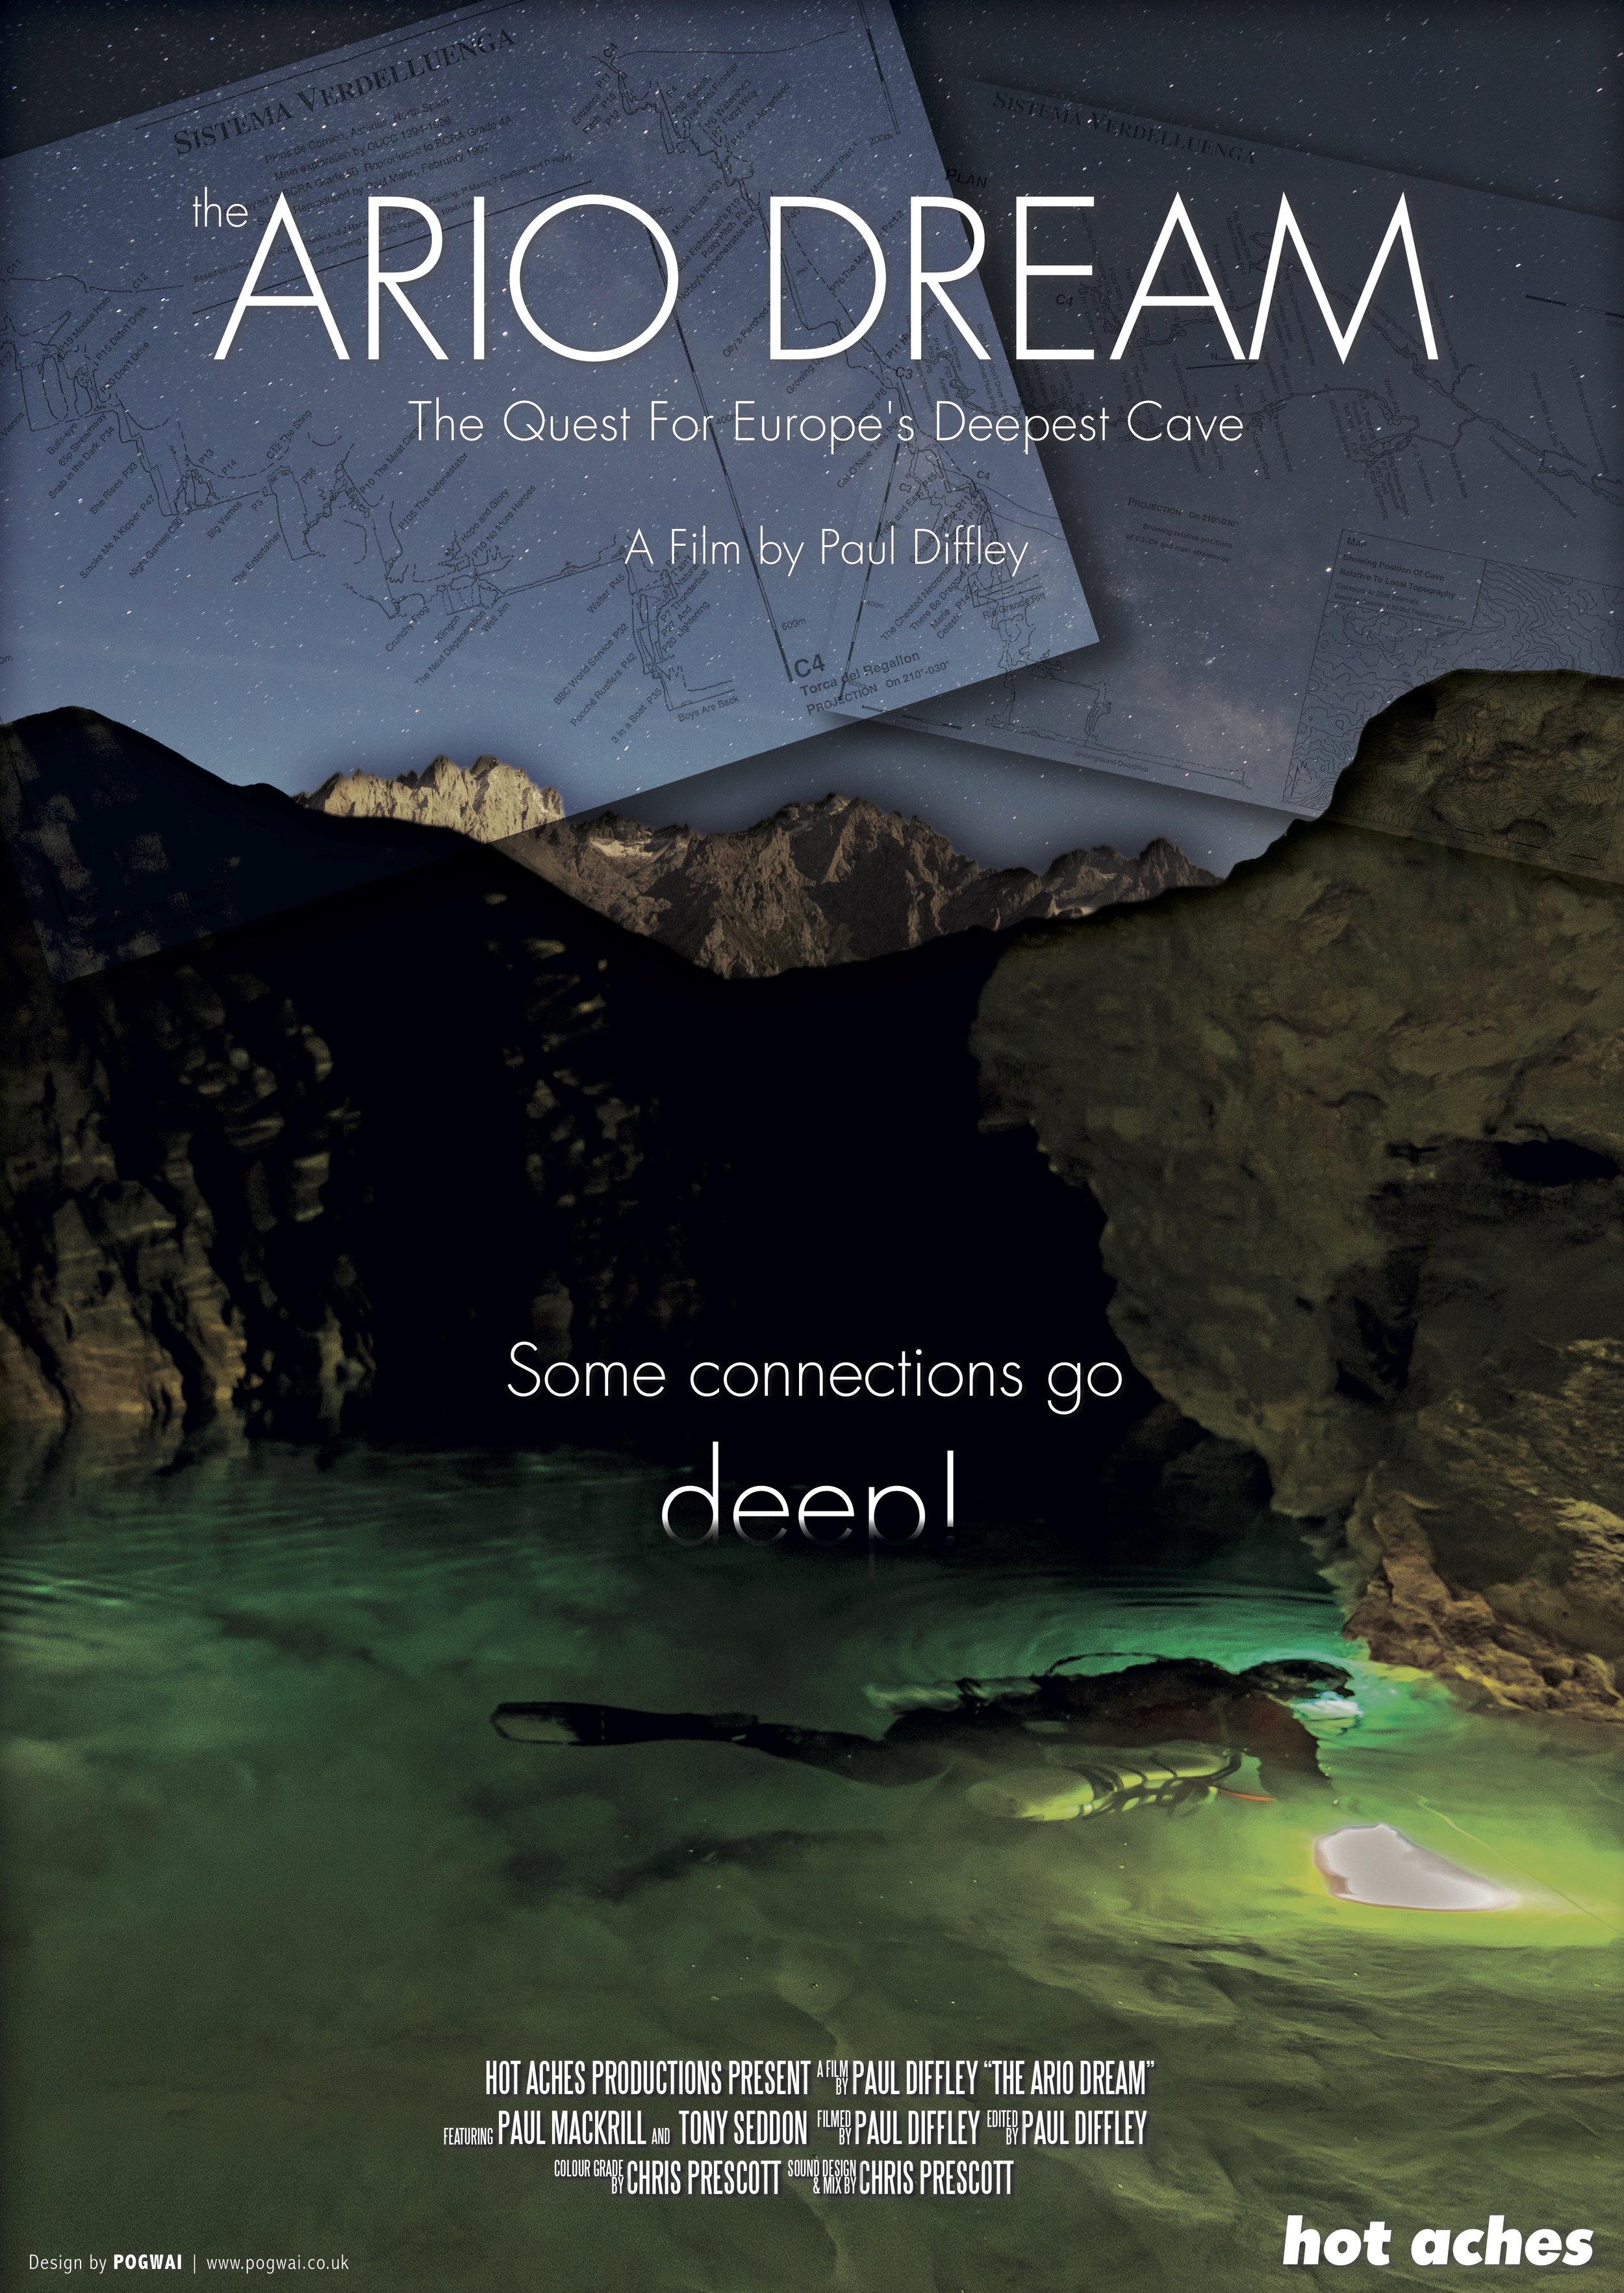 Ario Dream Final Poster layout.jpg